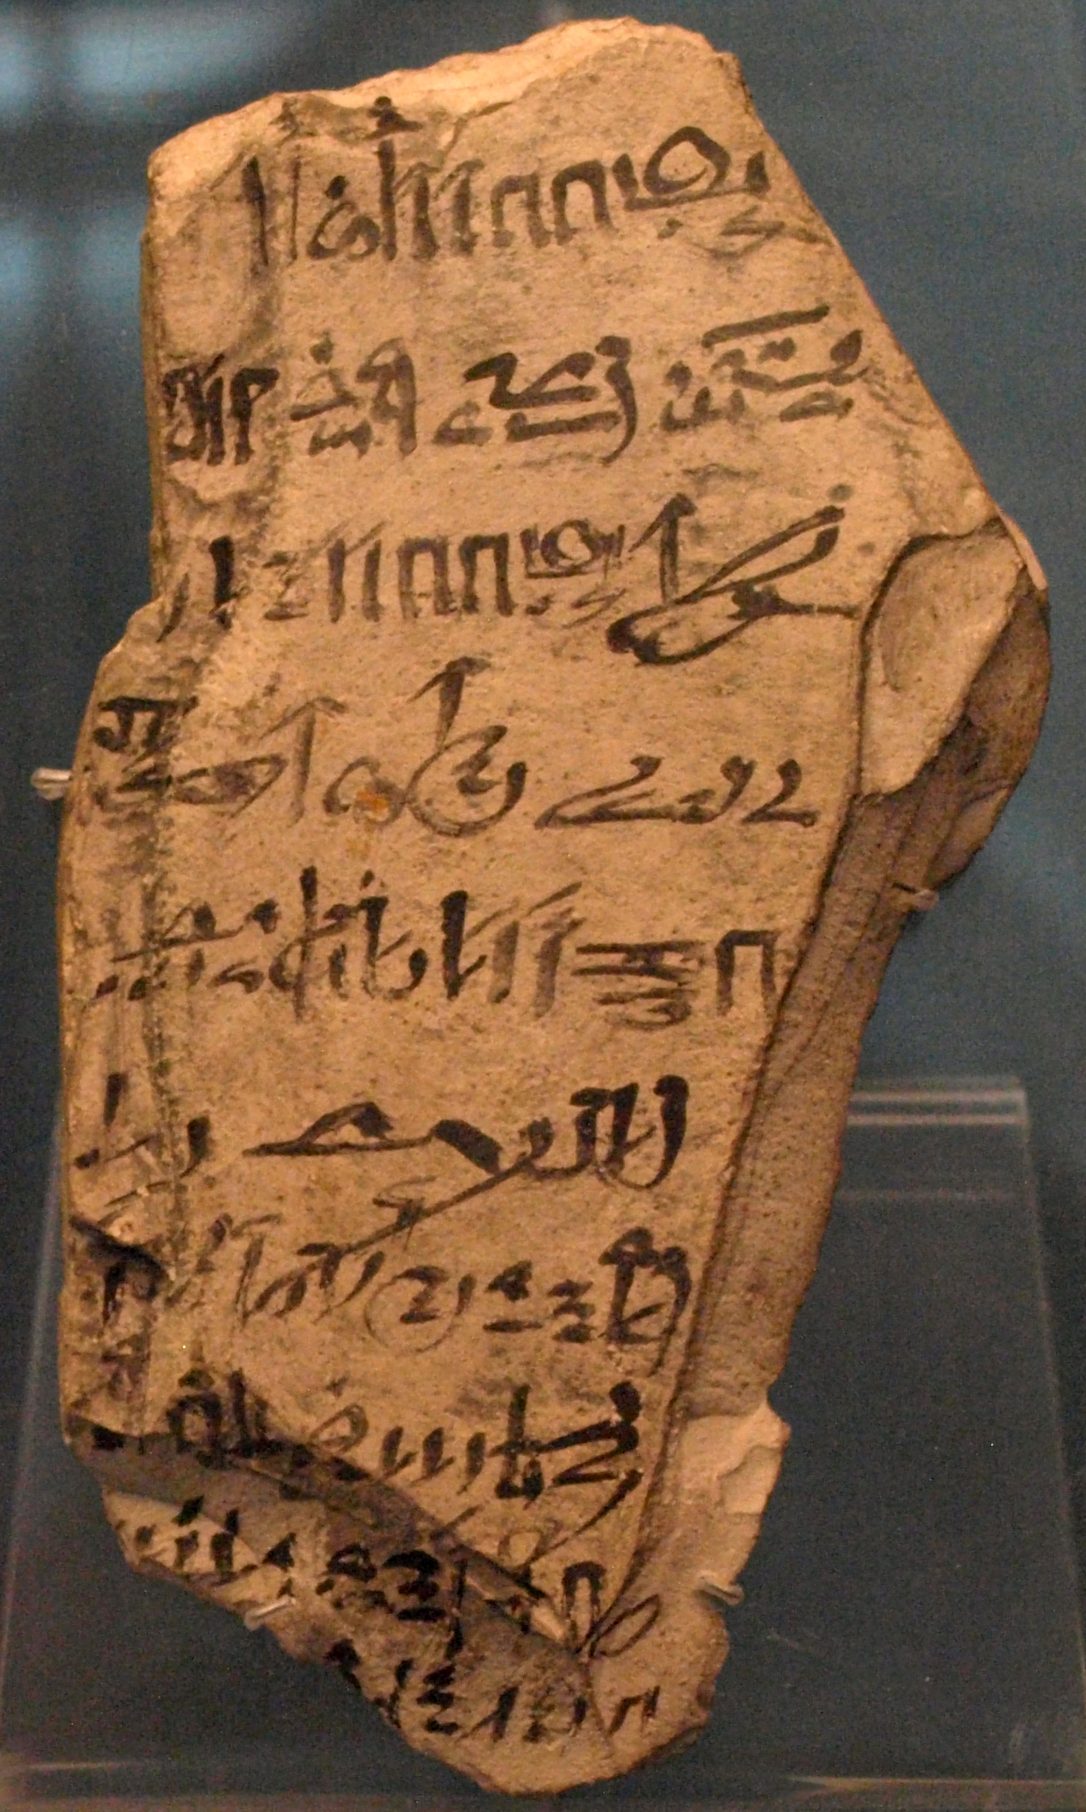 древнего египта картинки с названиями